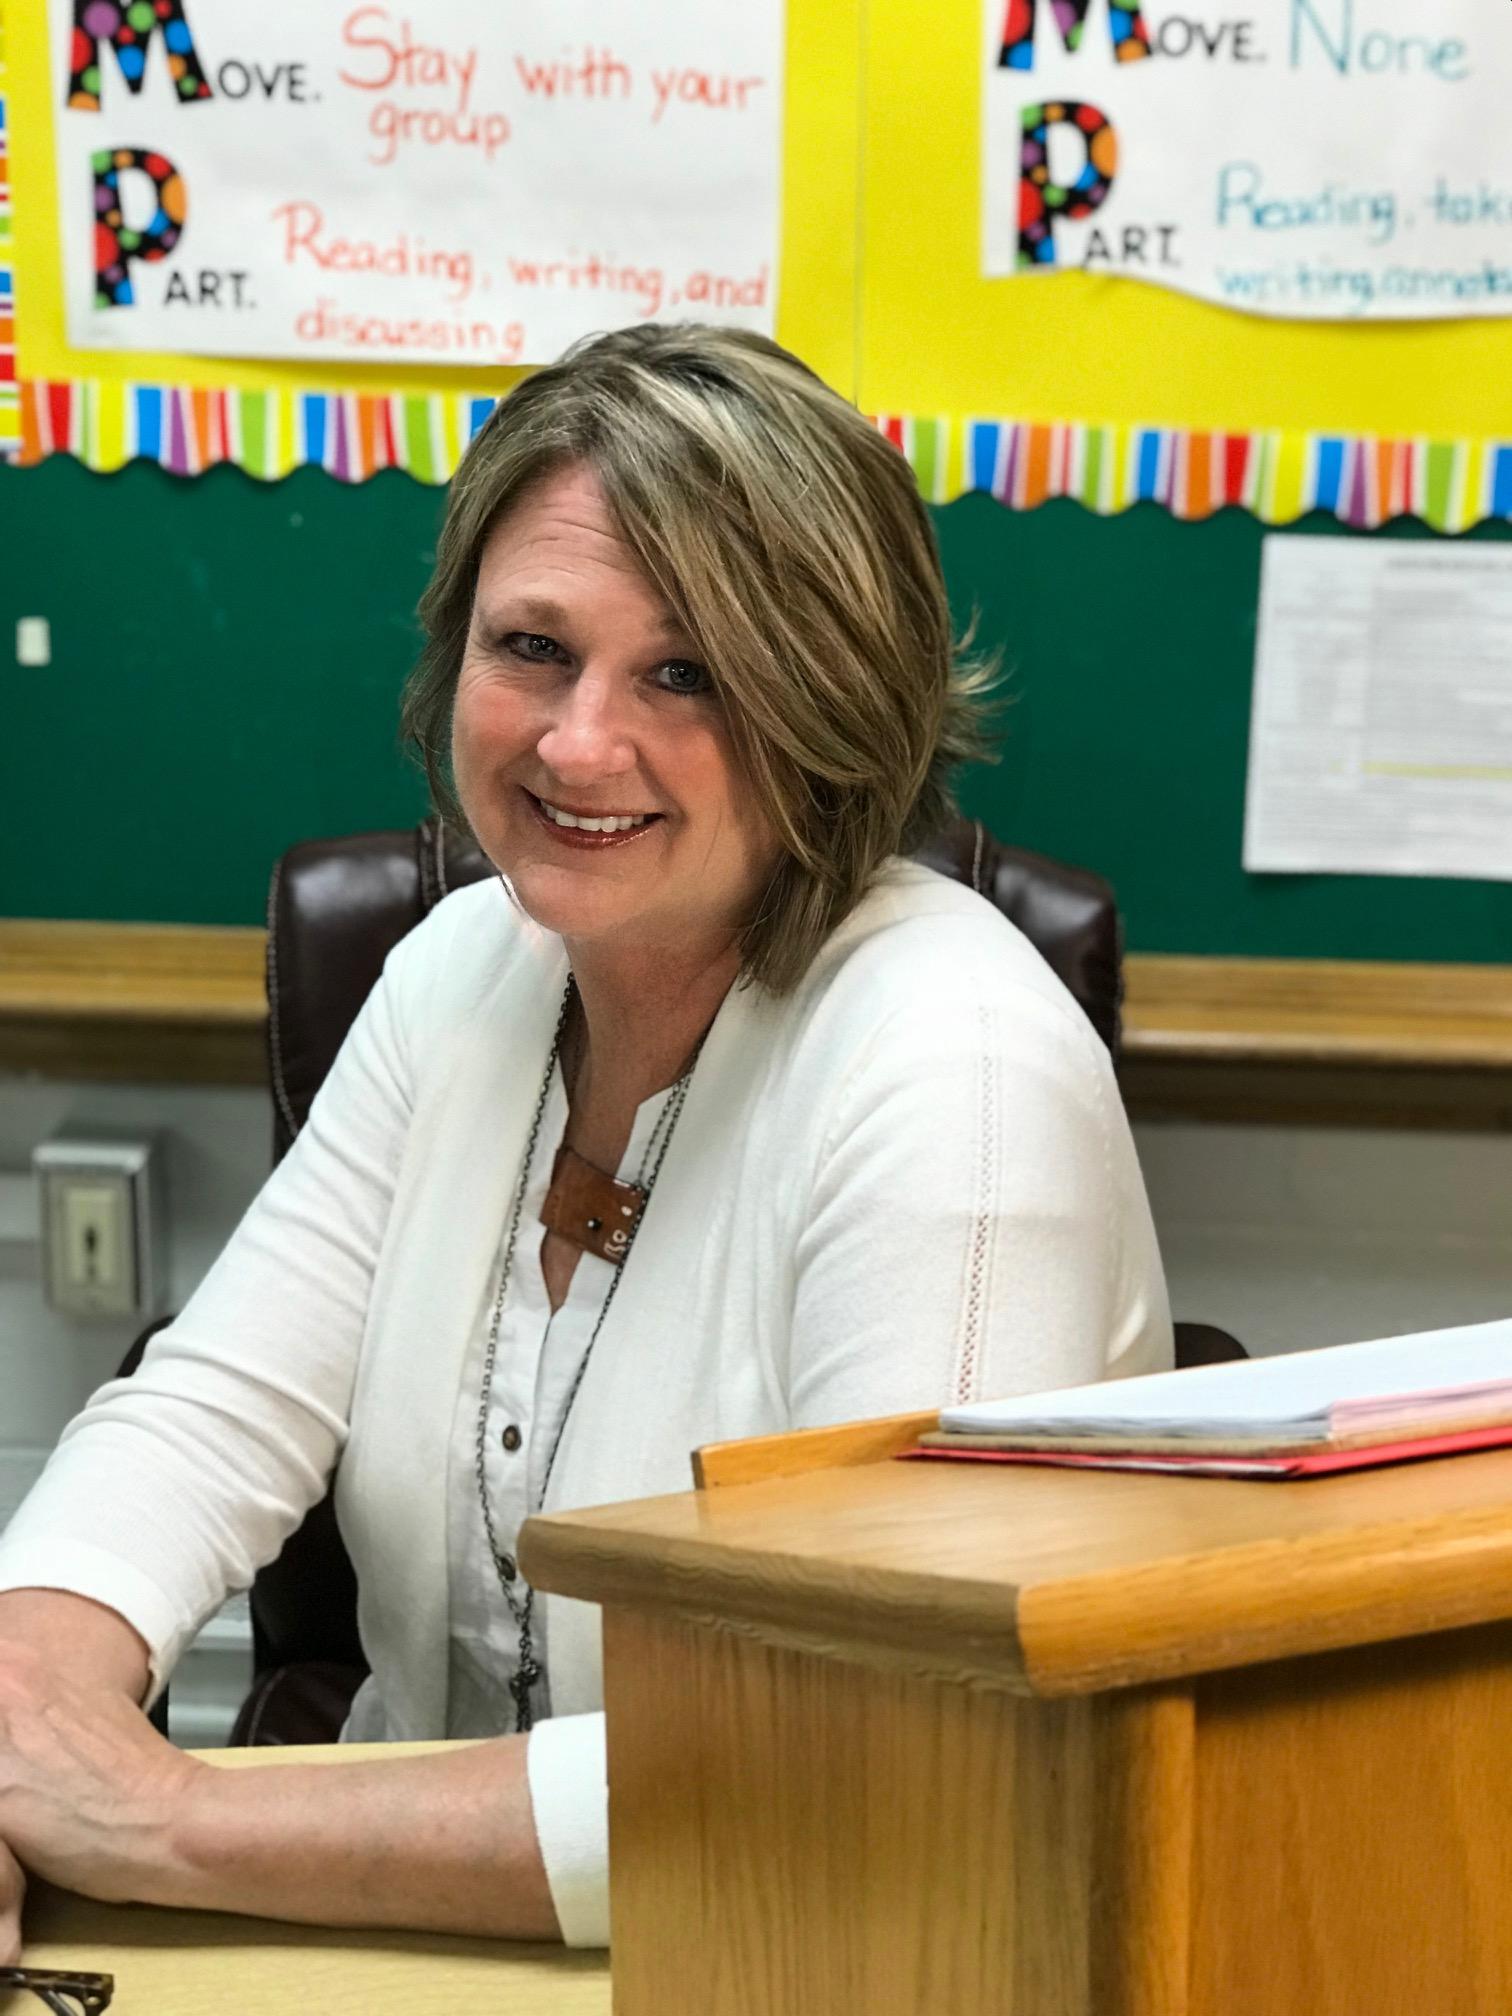 Kristi at School 2.JPG